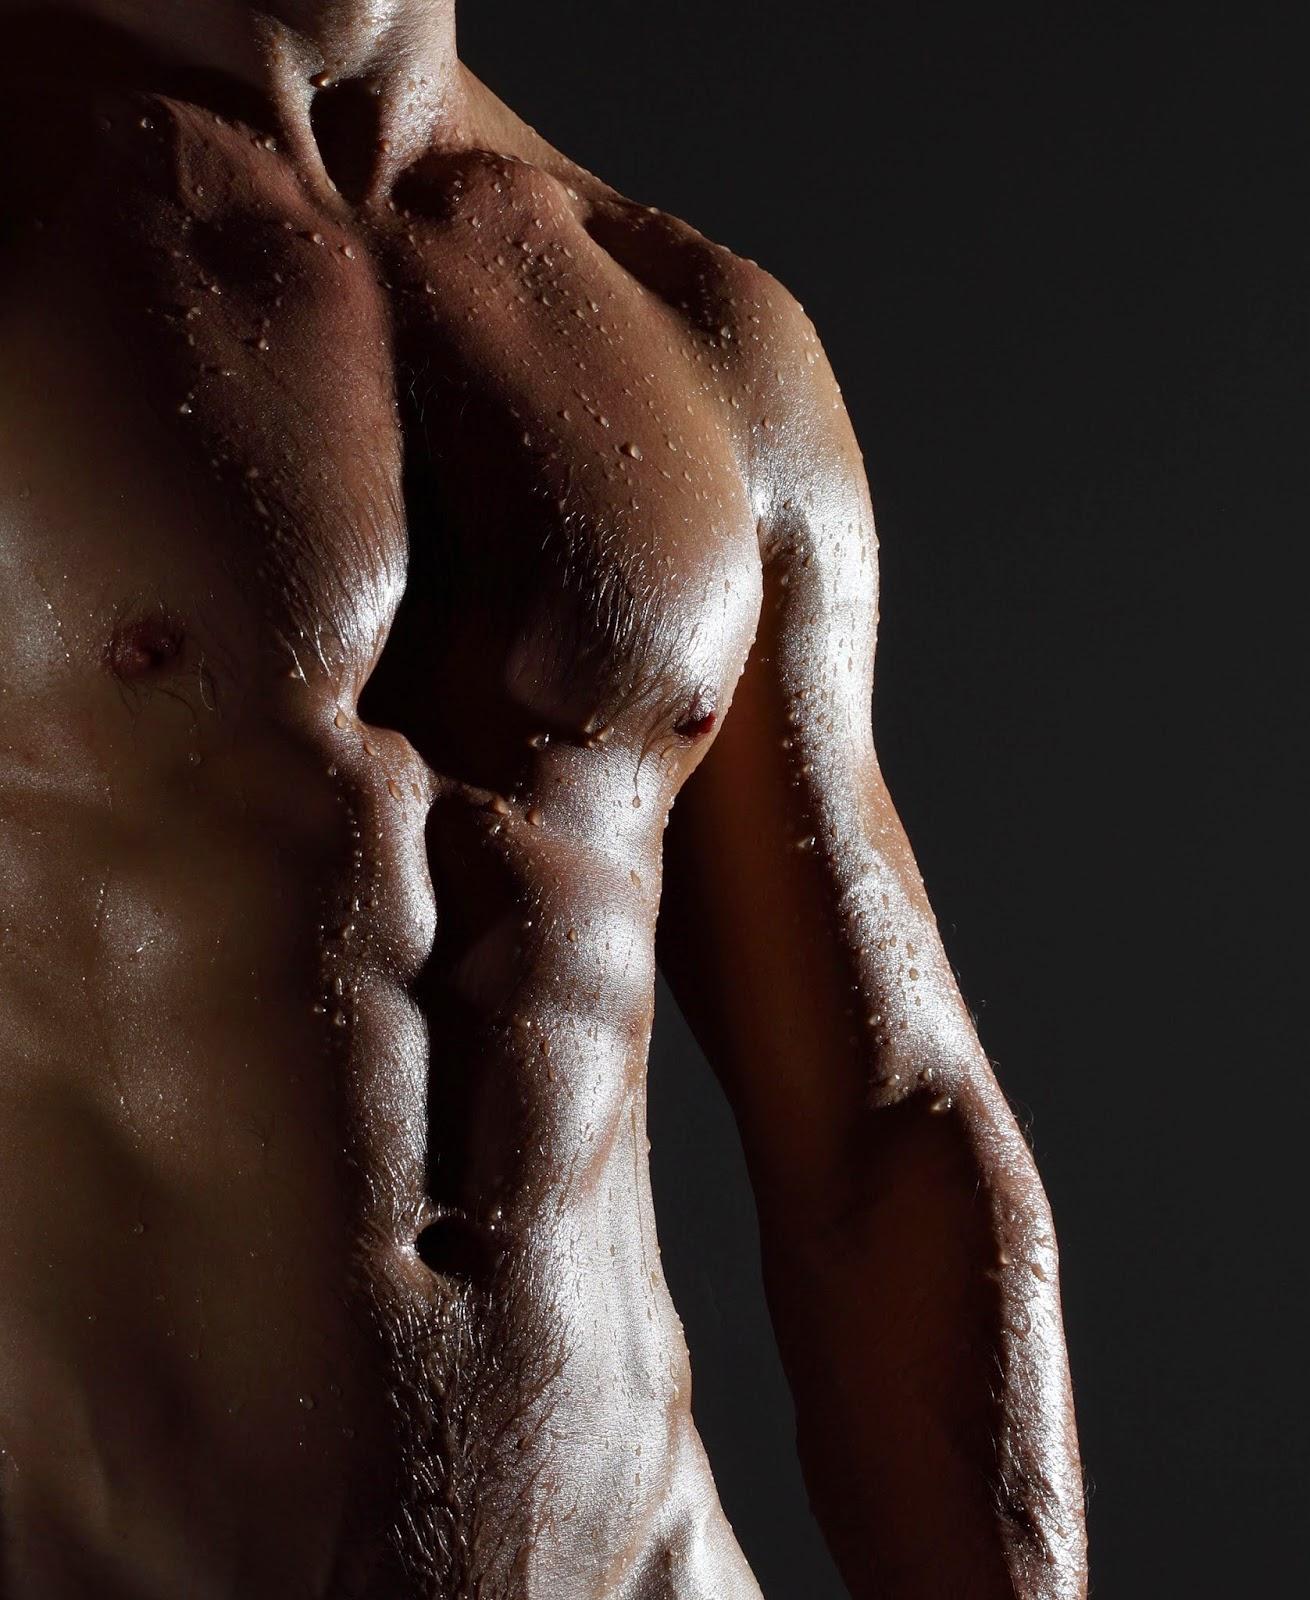 Тело голое спортивное @ bigobe.com